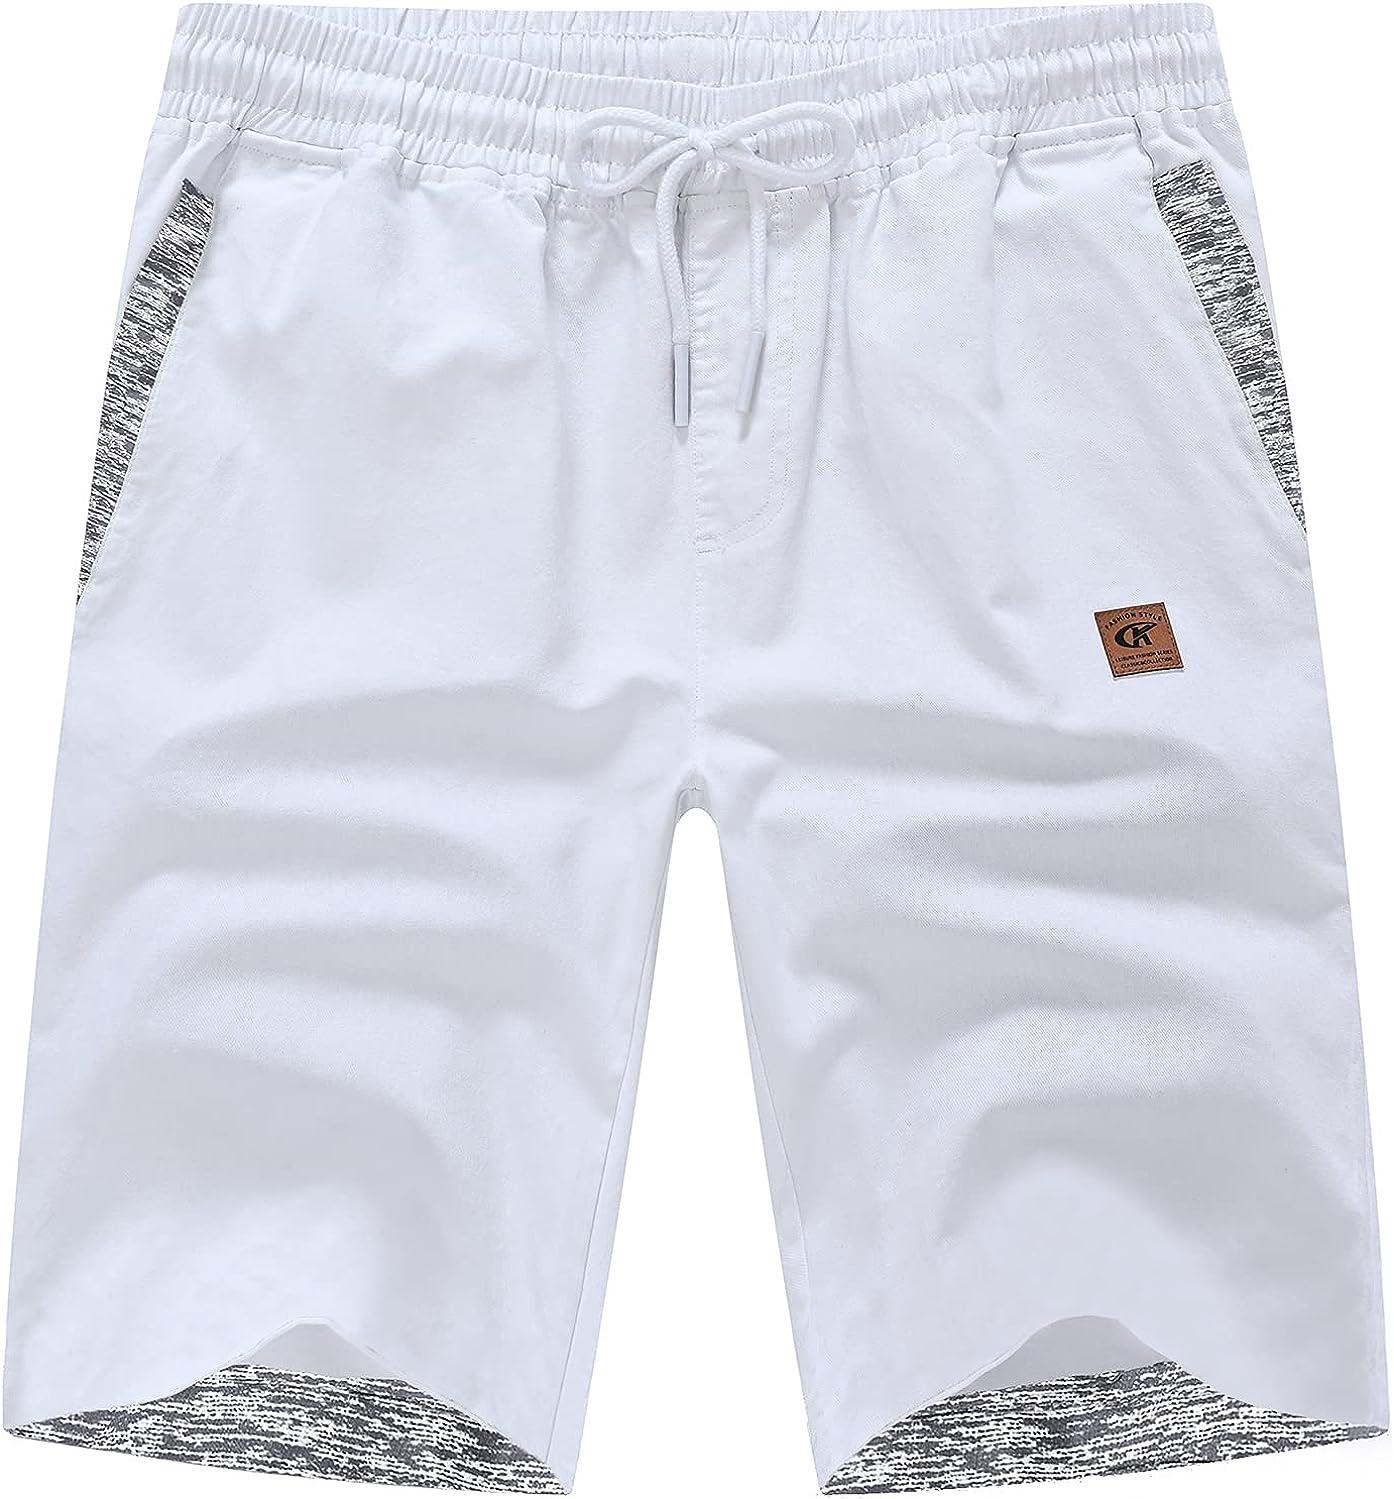 Satankud Men's Casual Drawstring Slim Elastic Waist Cotton Shorts